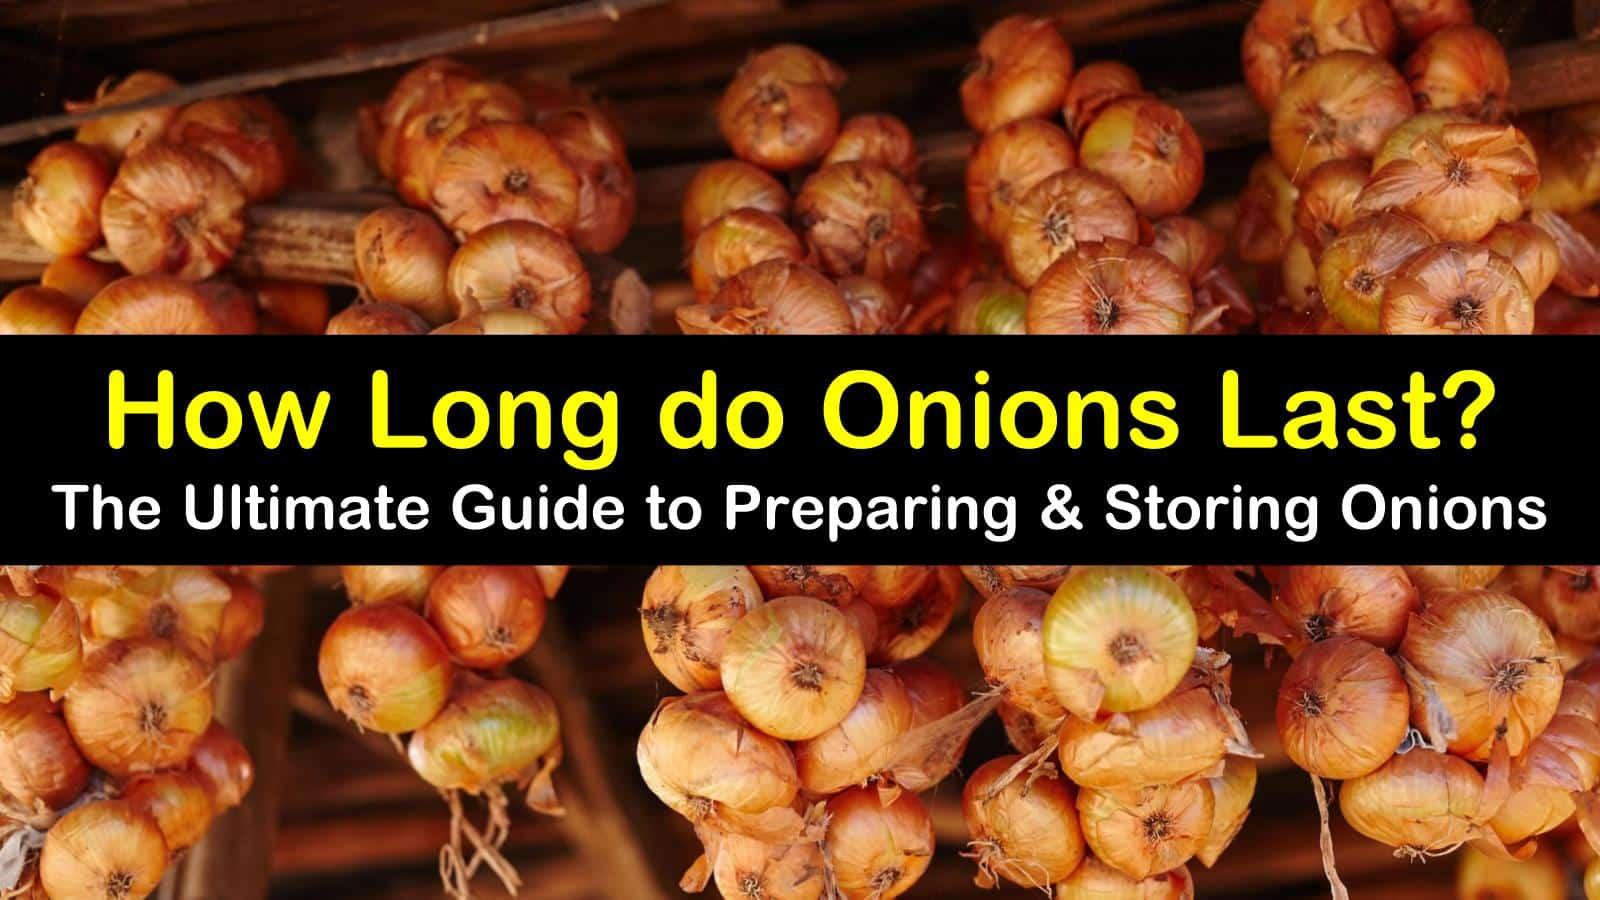 how long do onions last titleimg1